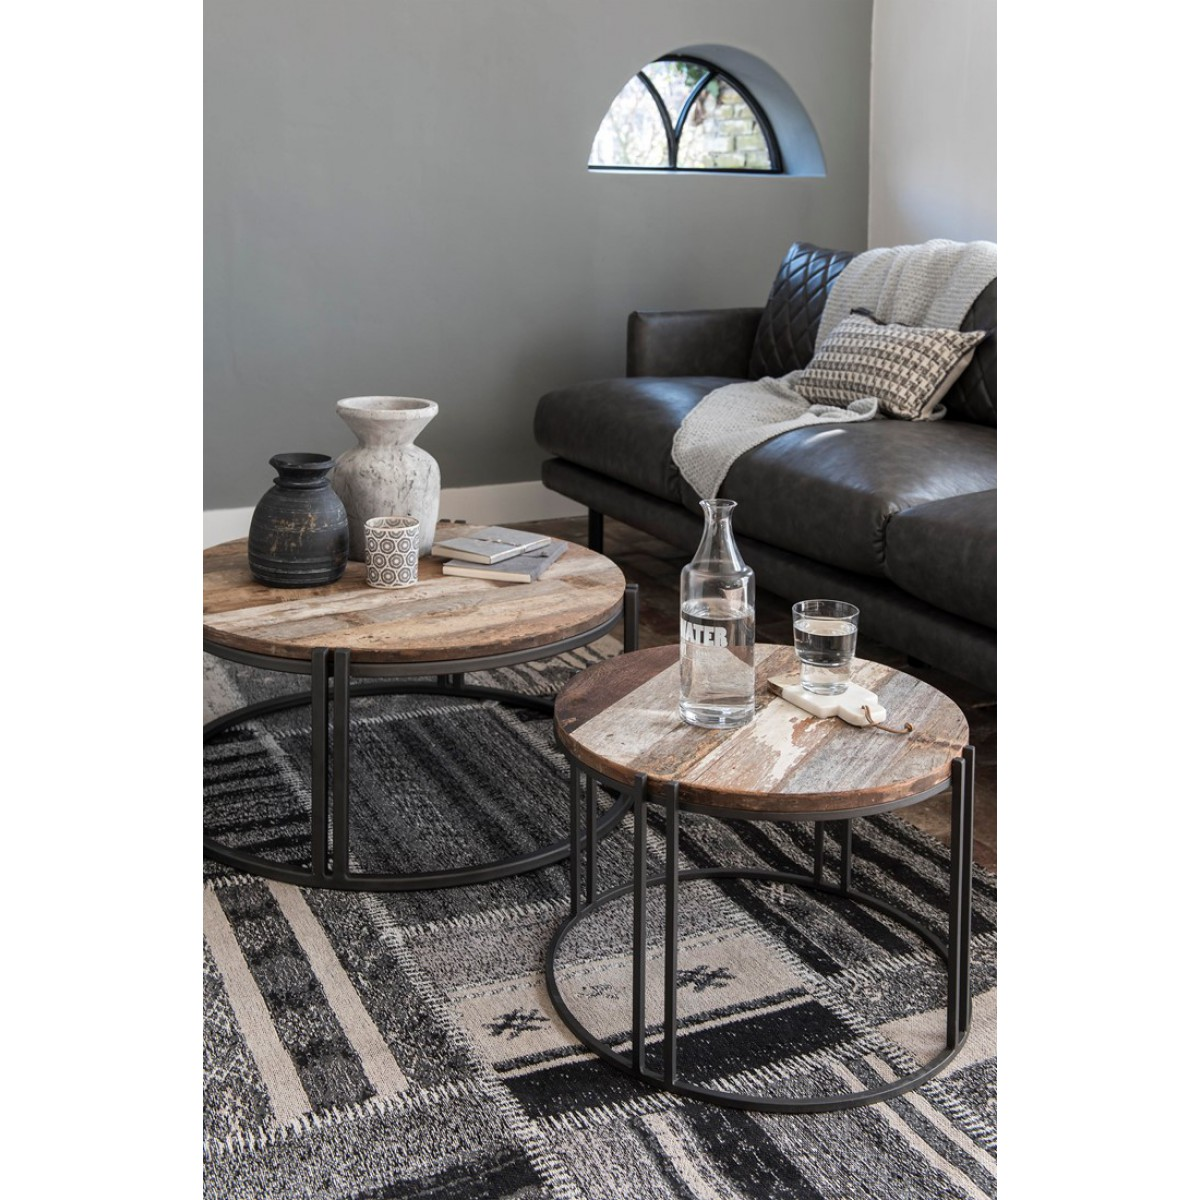 tuareg-salontafel-rond-35xo52-cm-miltonhouse